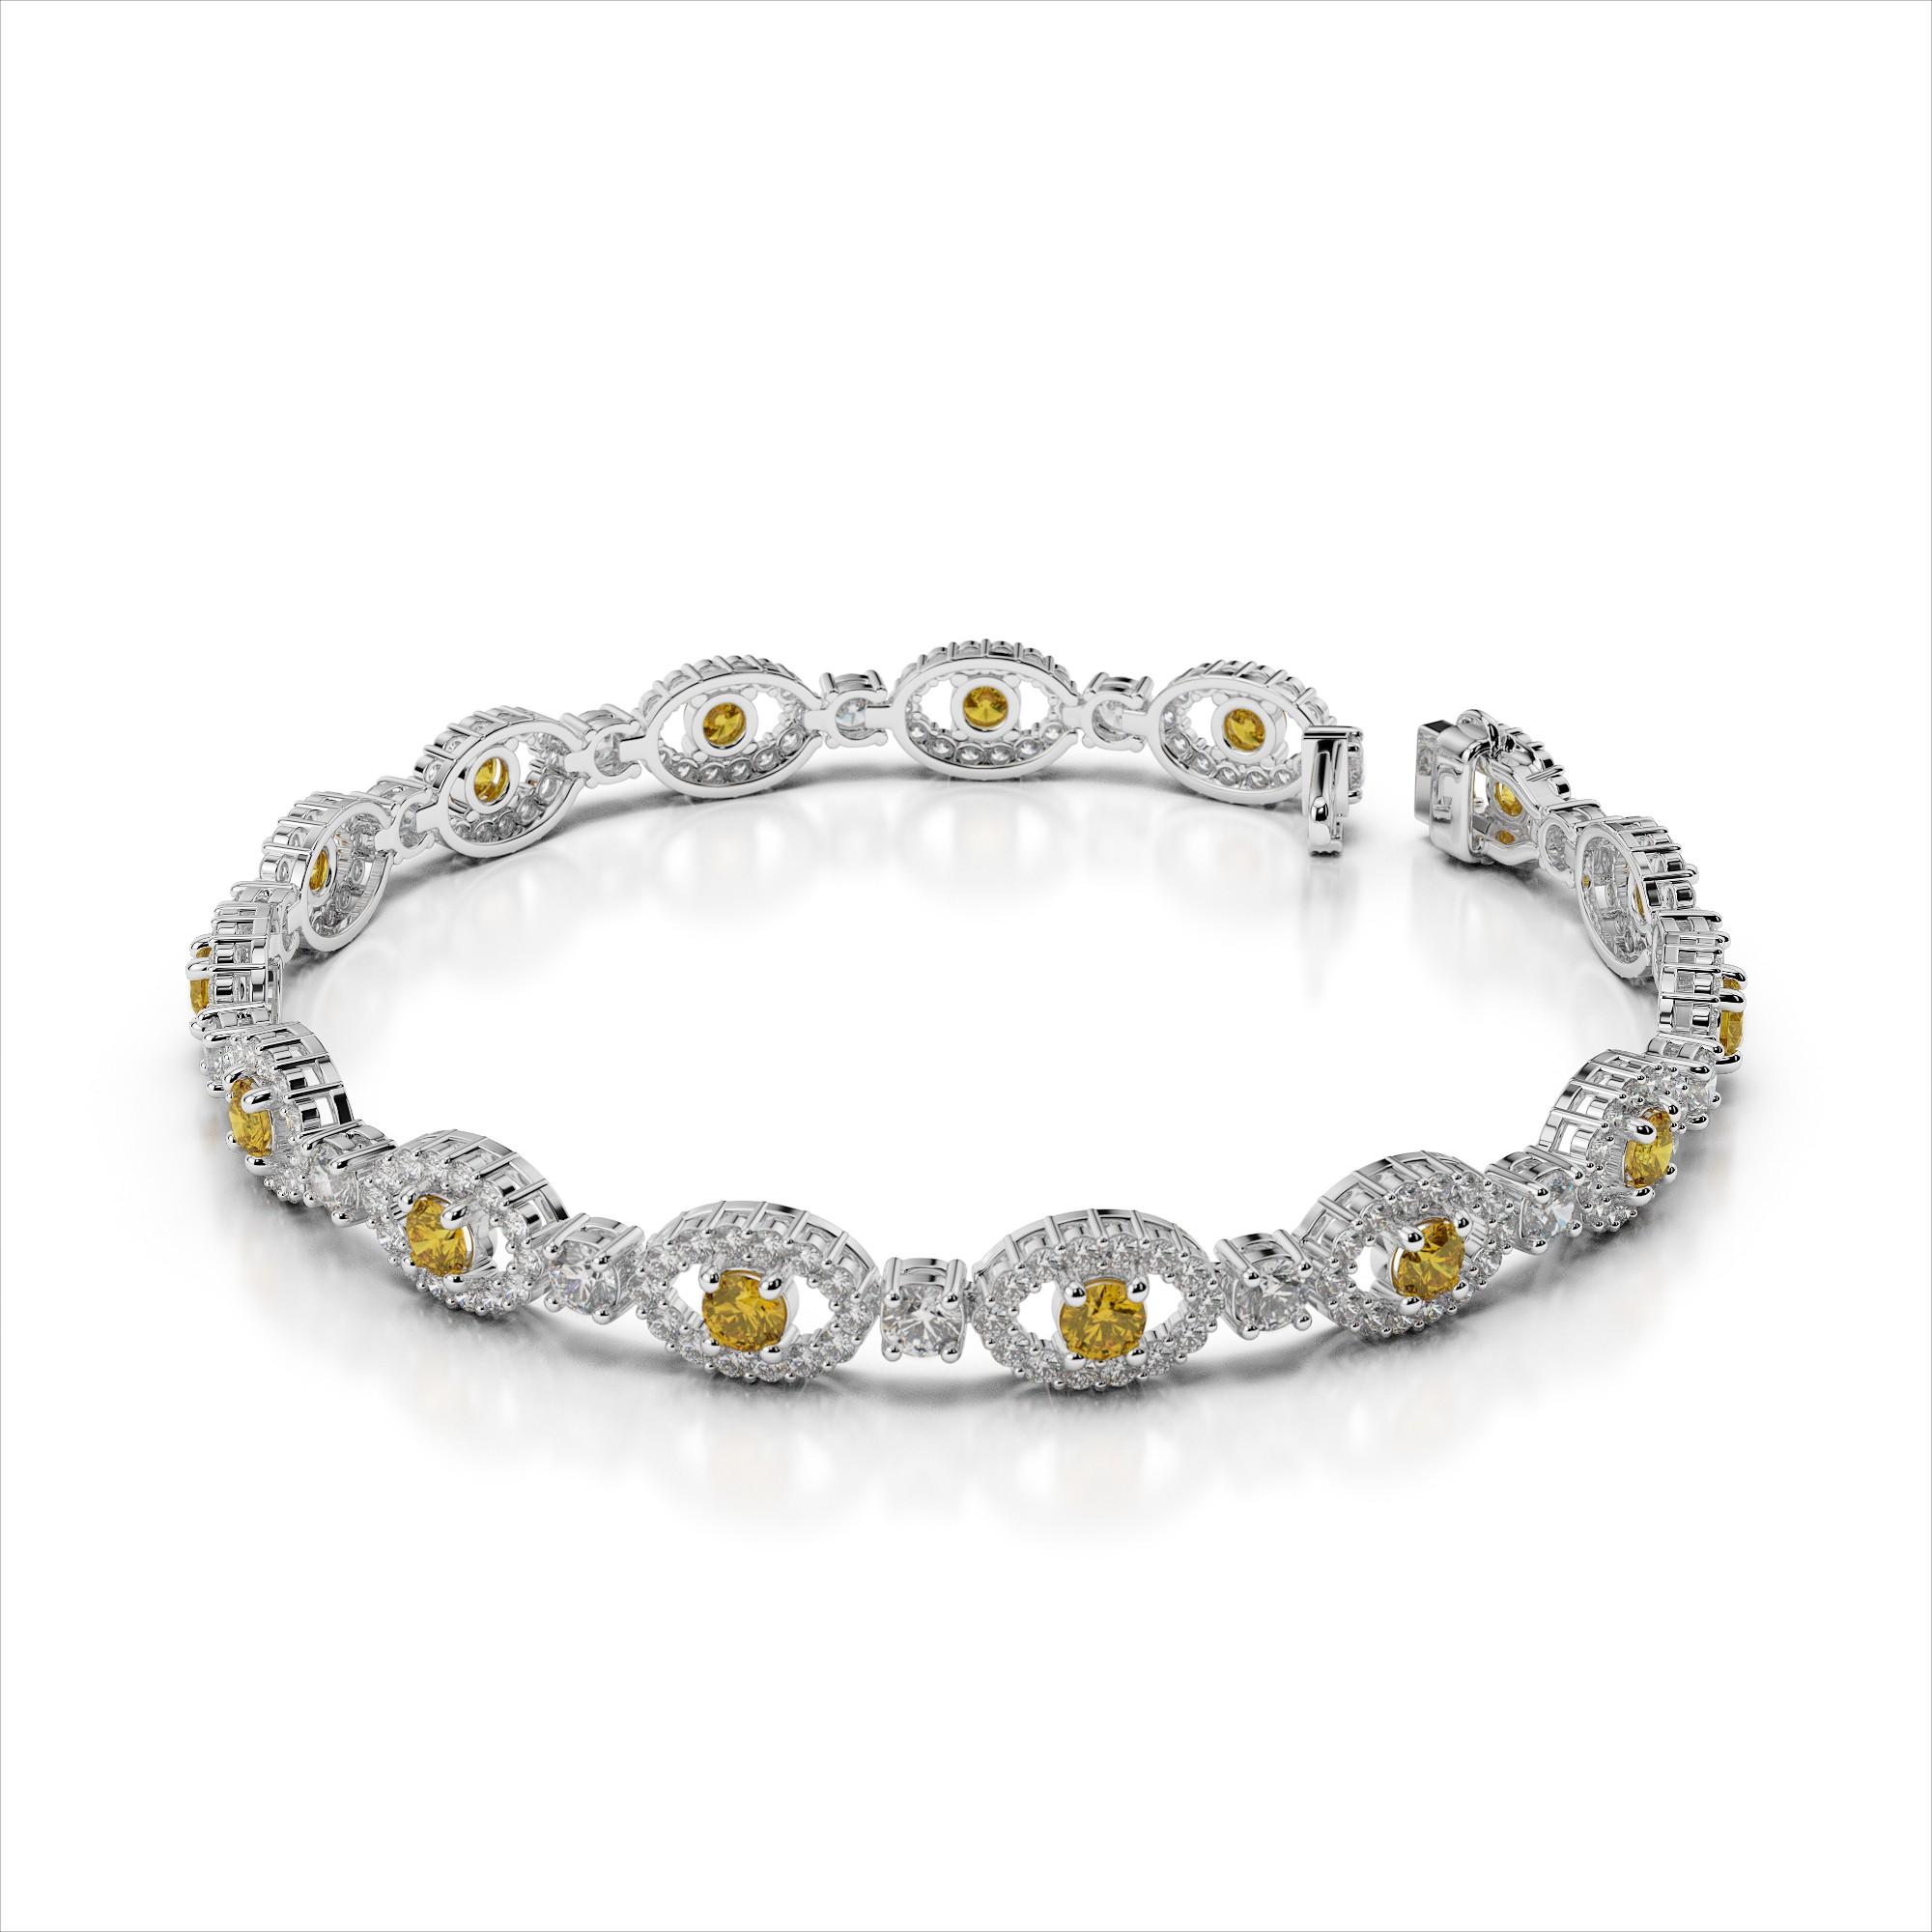 Oval Link Diamond & Gemstone Bracelet